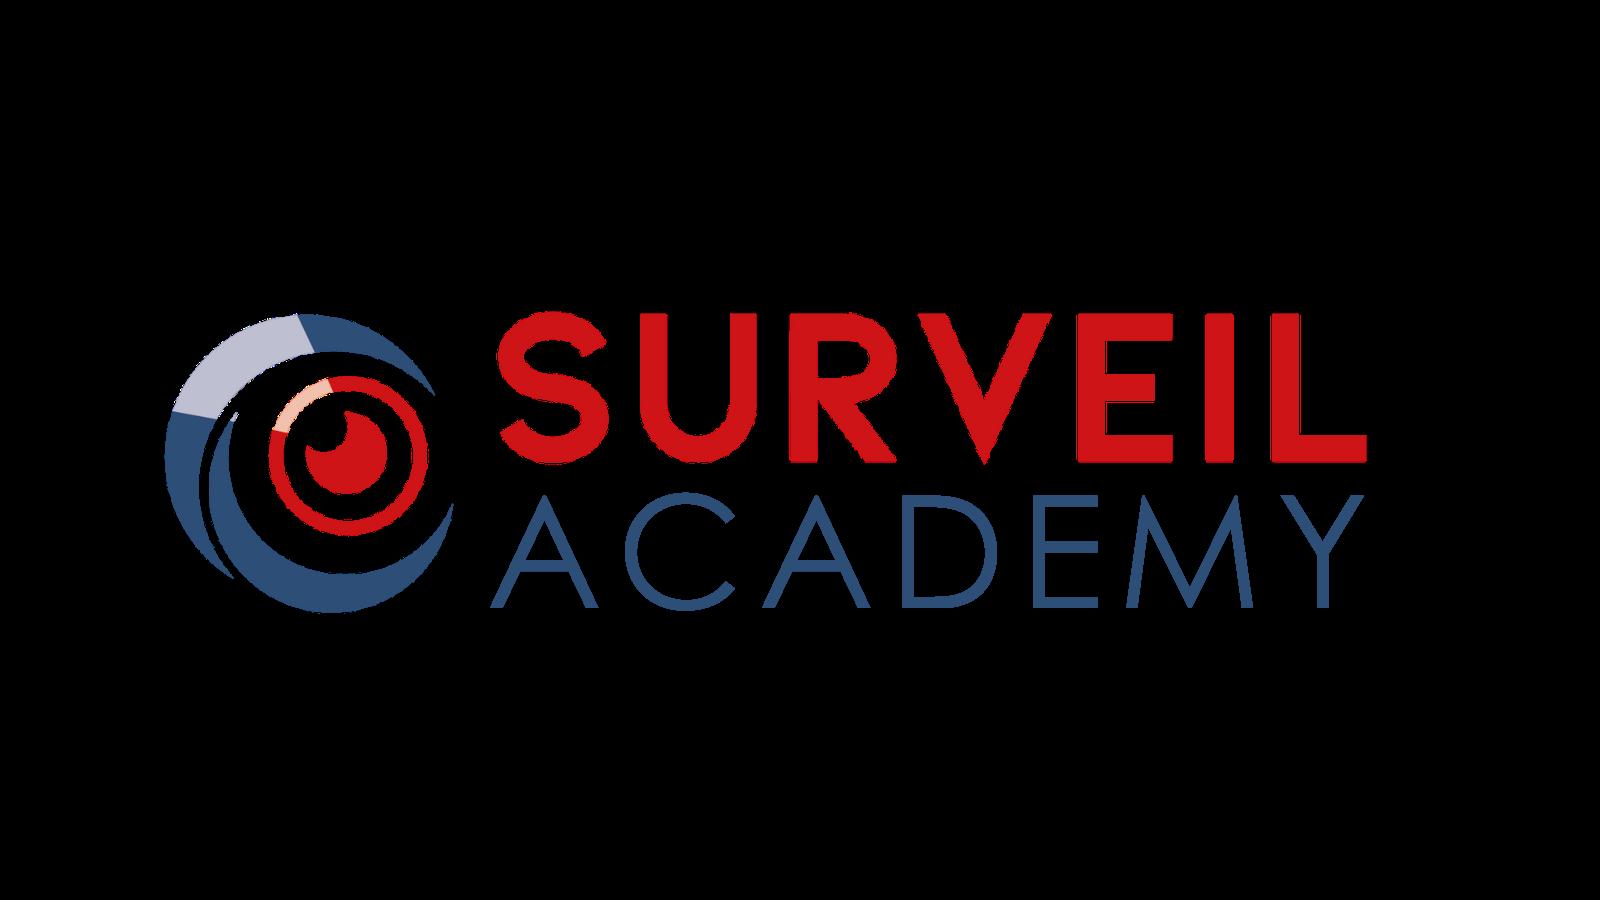 Surveil Together - Surveil Academy